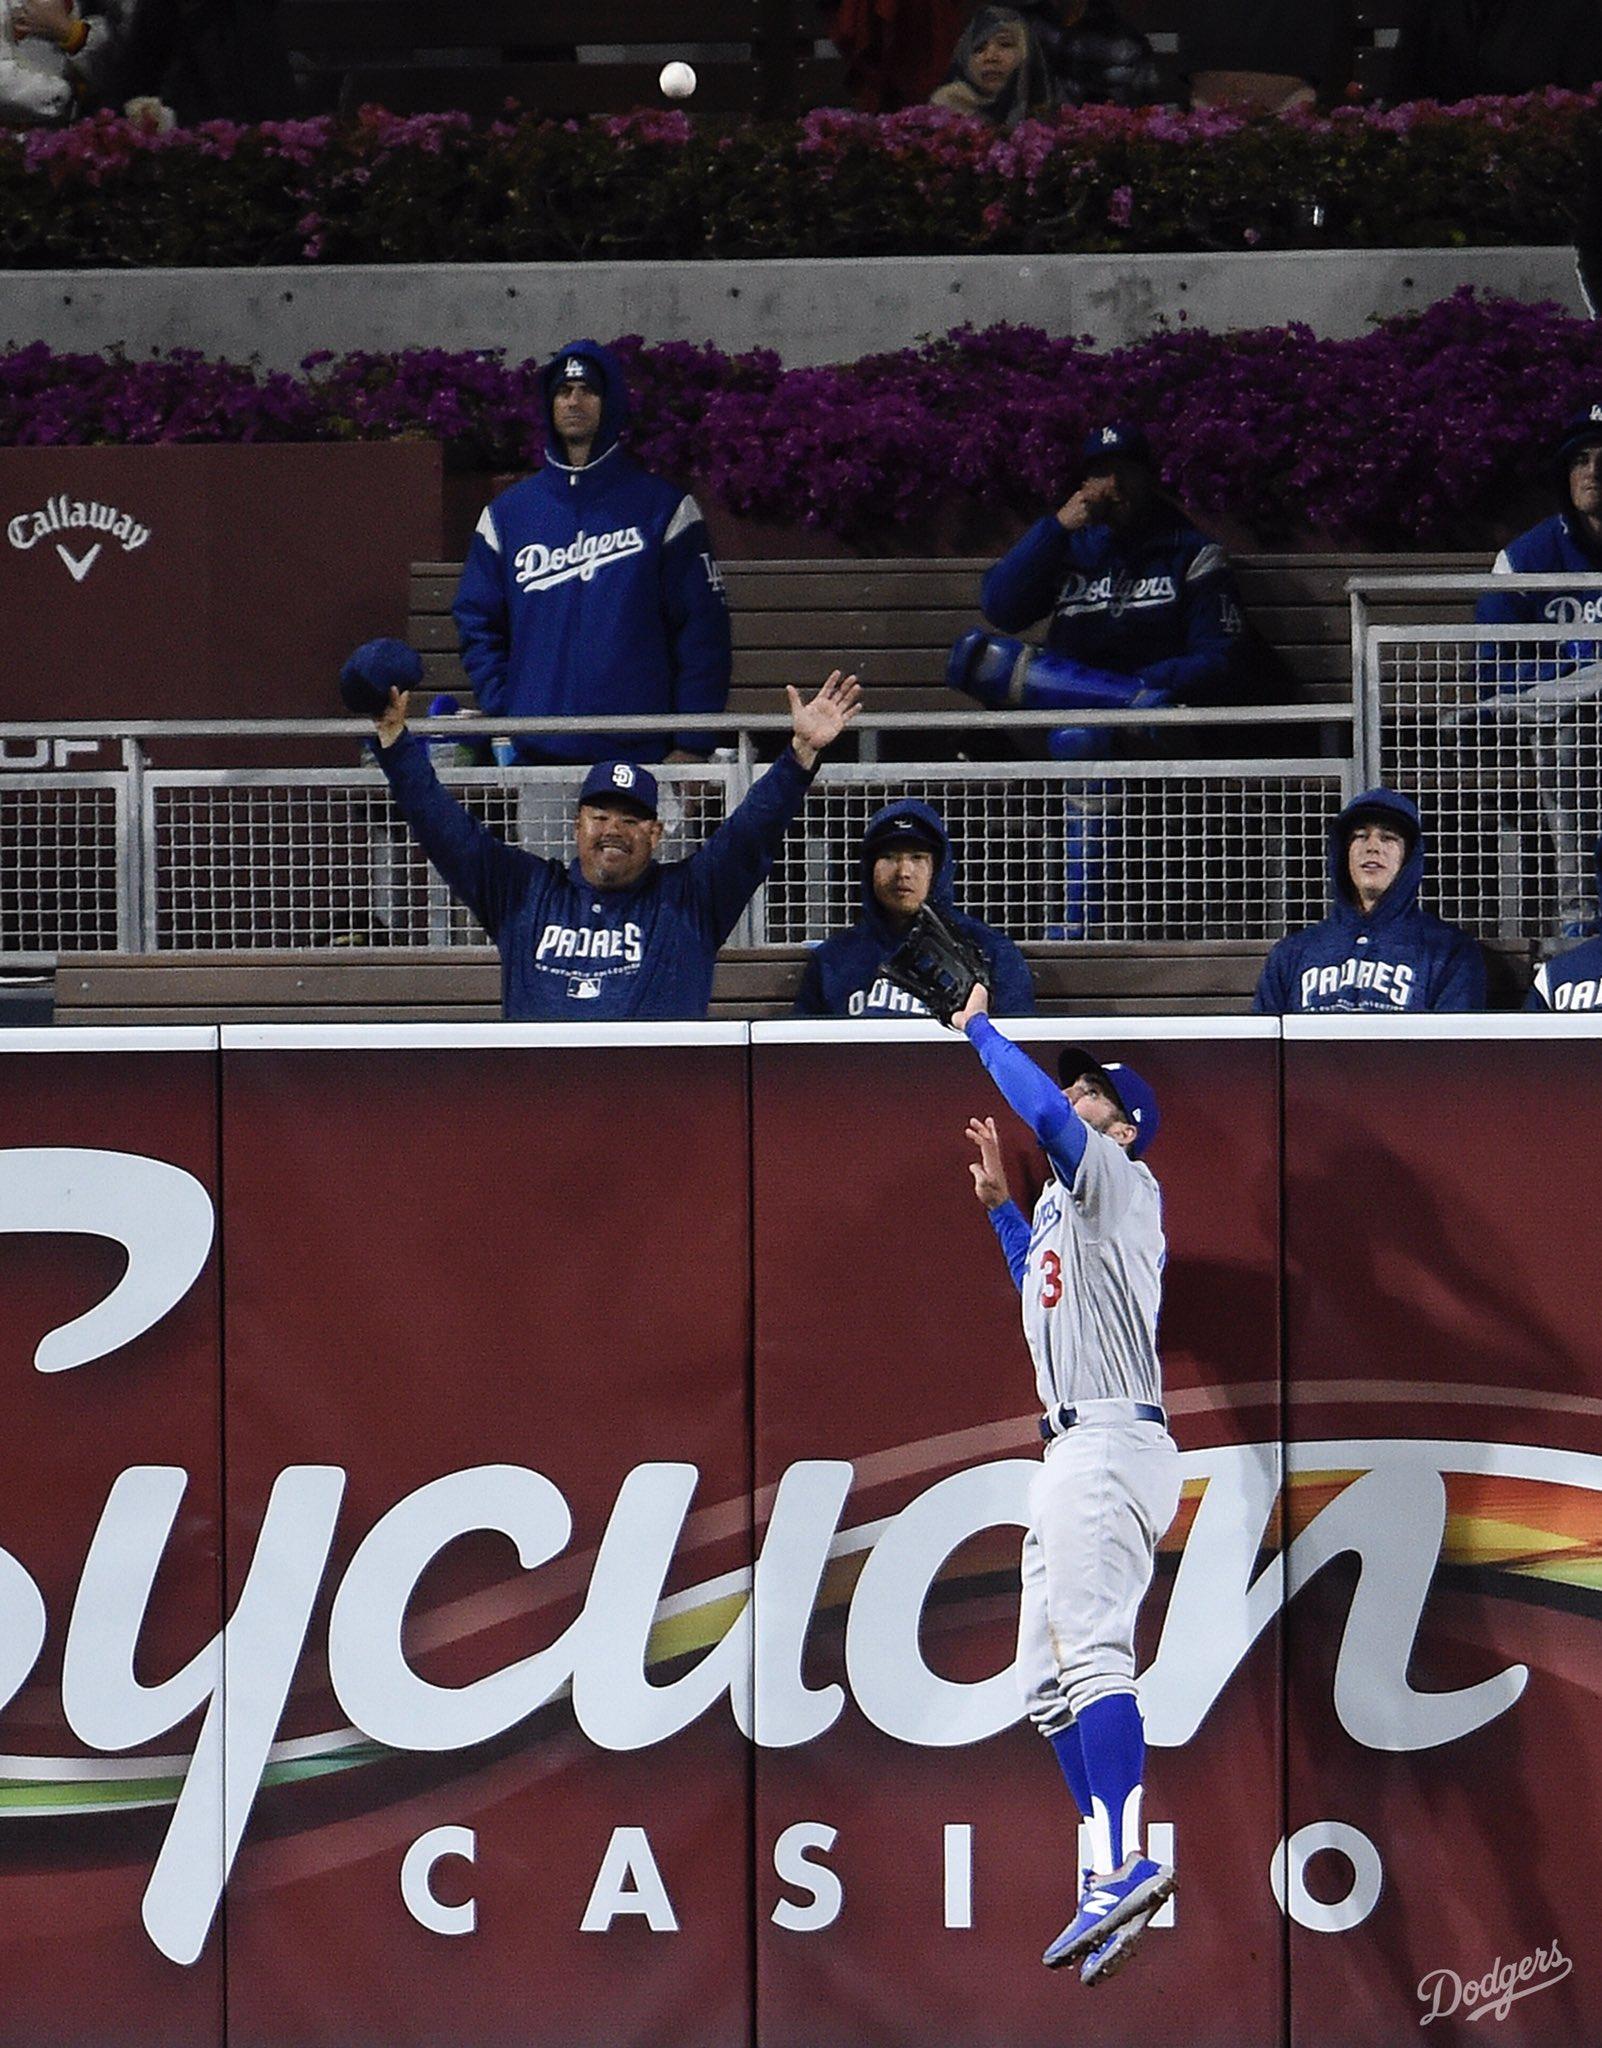 All eyes on CT3. #Dodgers https://t.co/qaITfRSDpQ